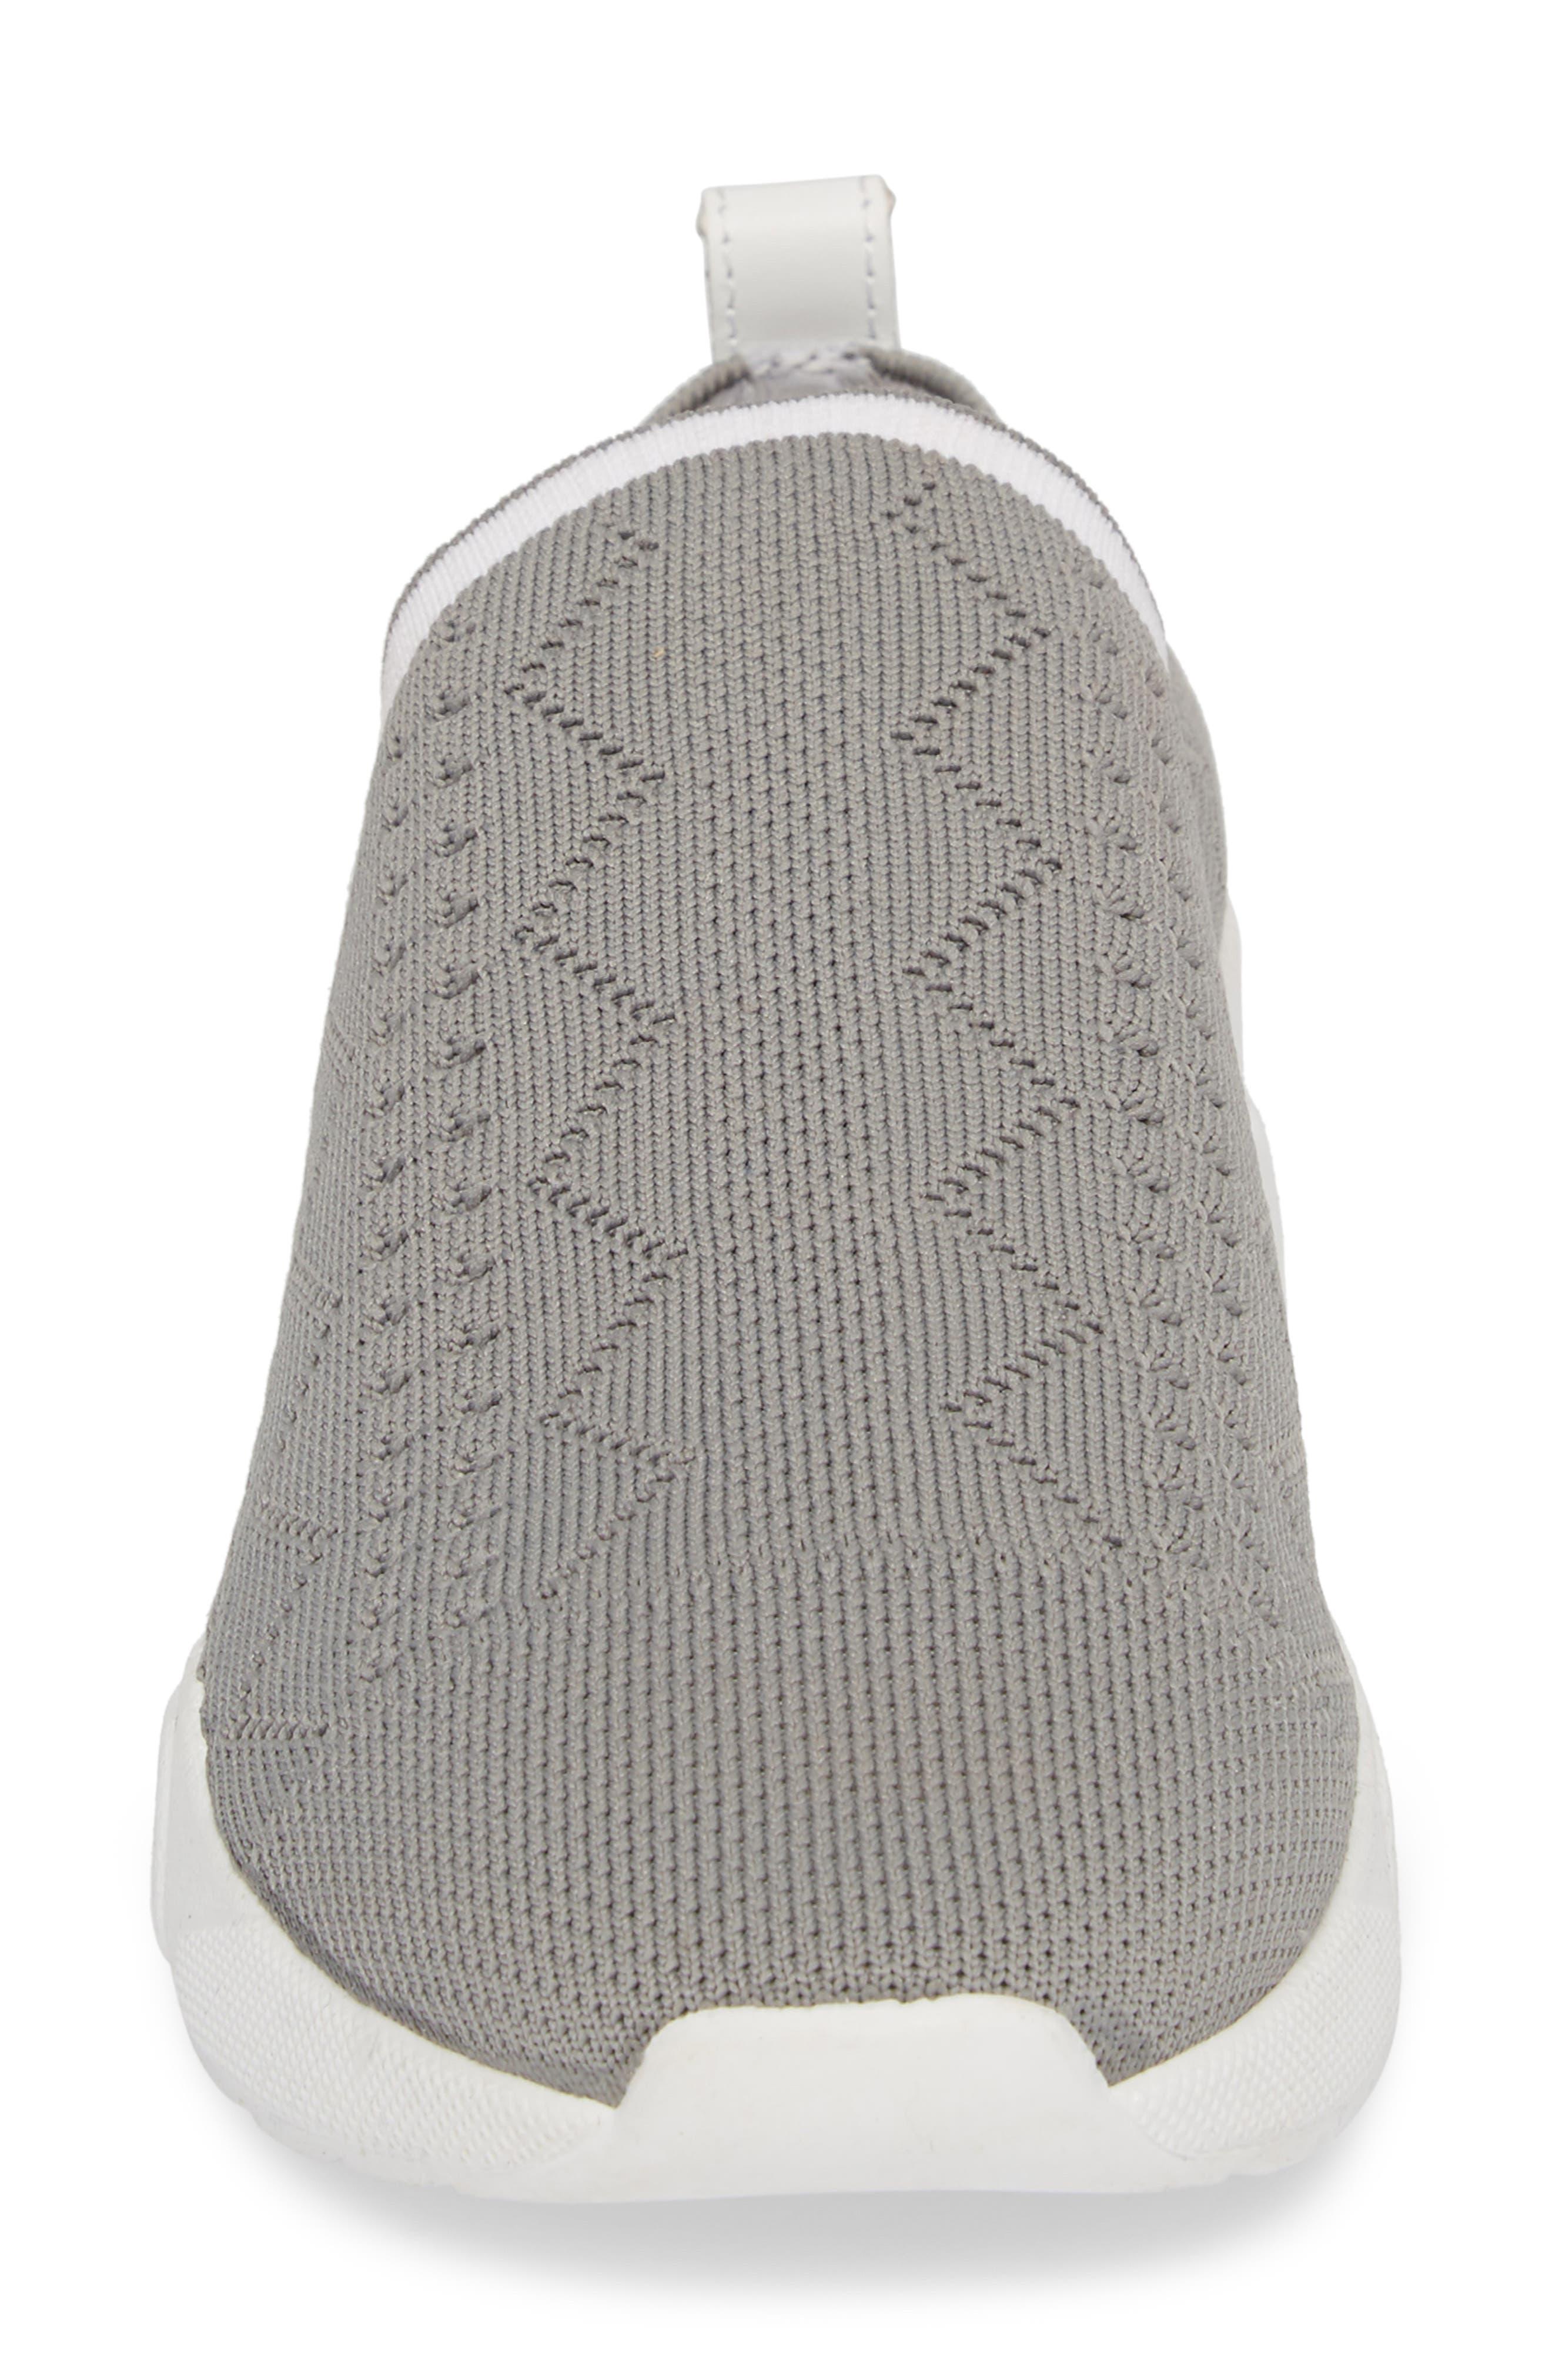 Karrie Slip-On Sneaker,                             Alternate thumbnail 4, color,                             Grey Stretch Fabric